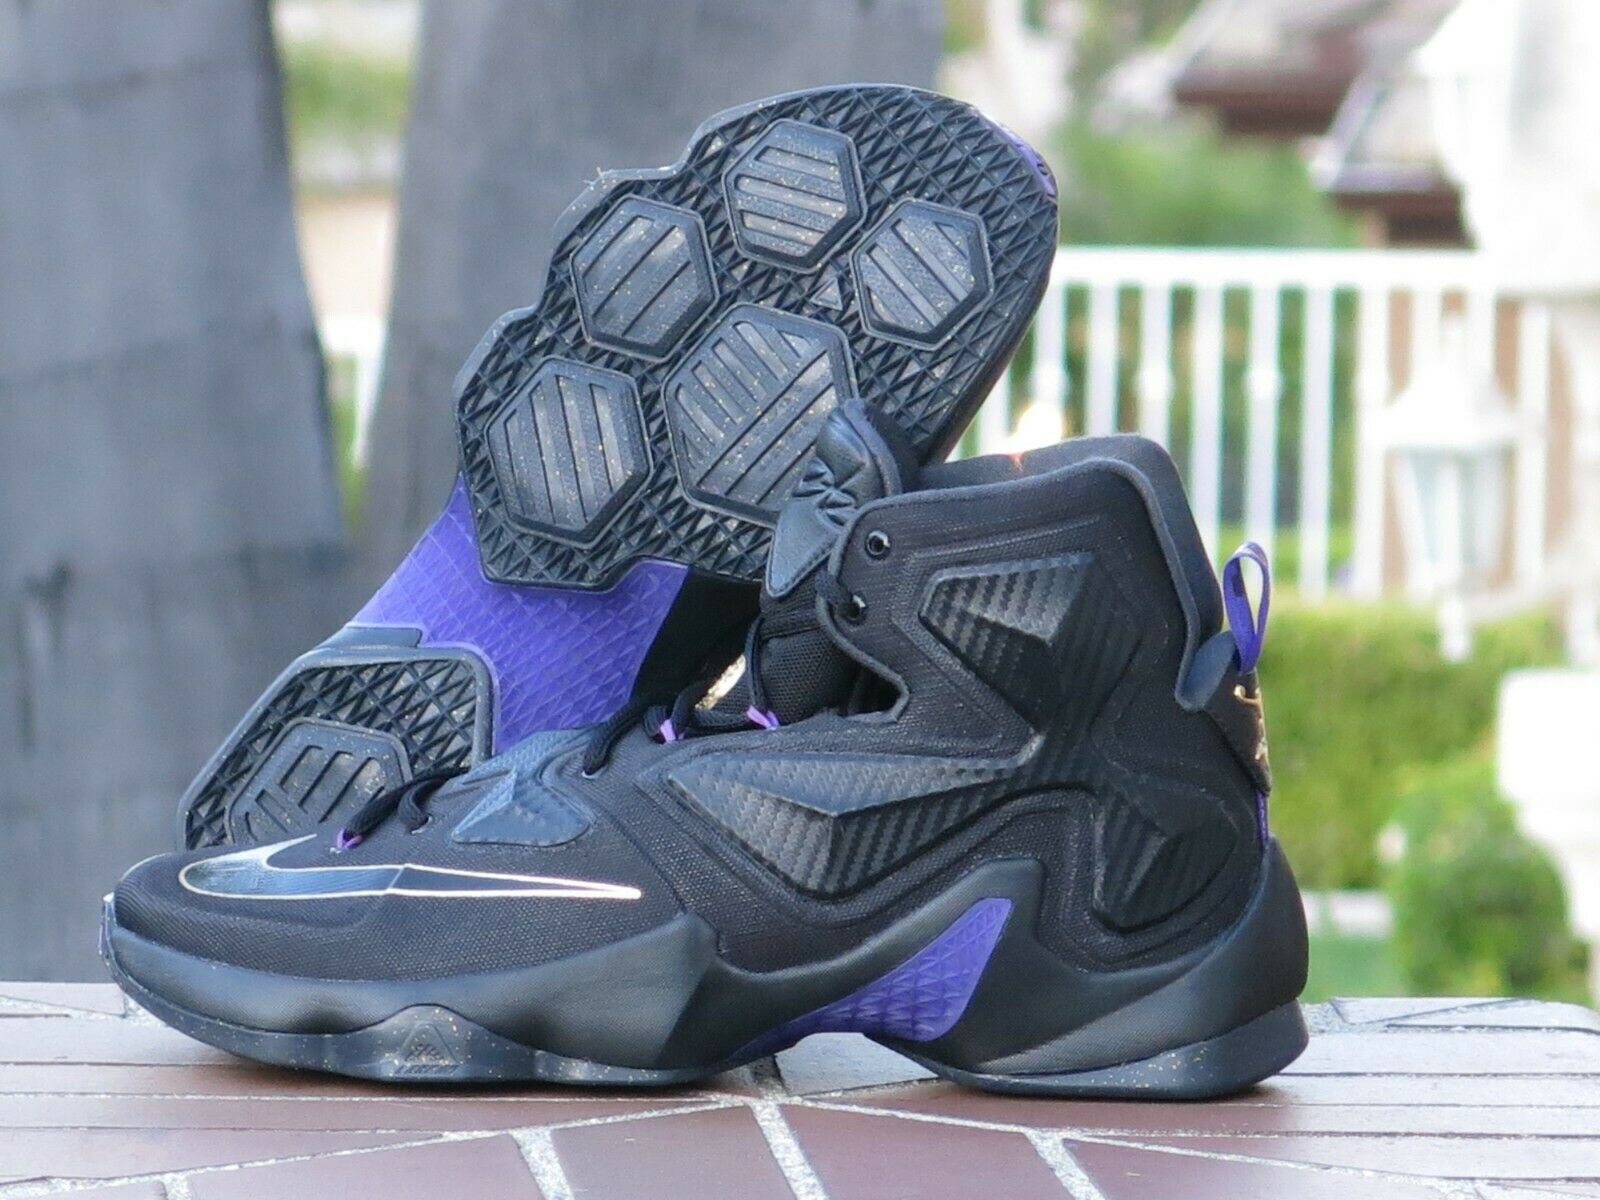 Nike Lebron James XIII Men's Basketball Sneakers 807219-007